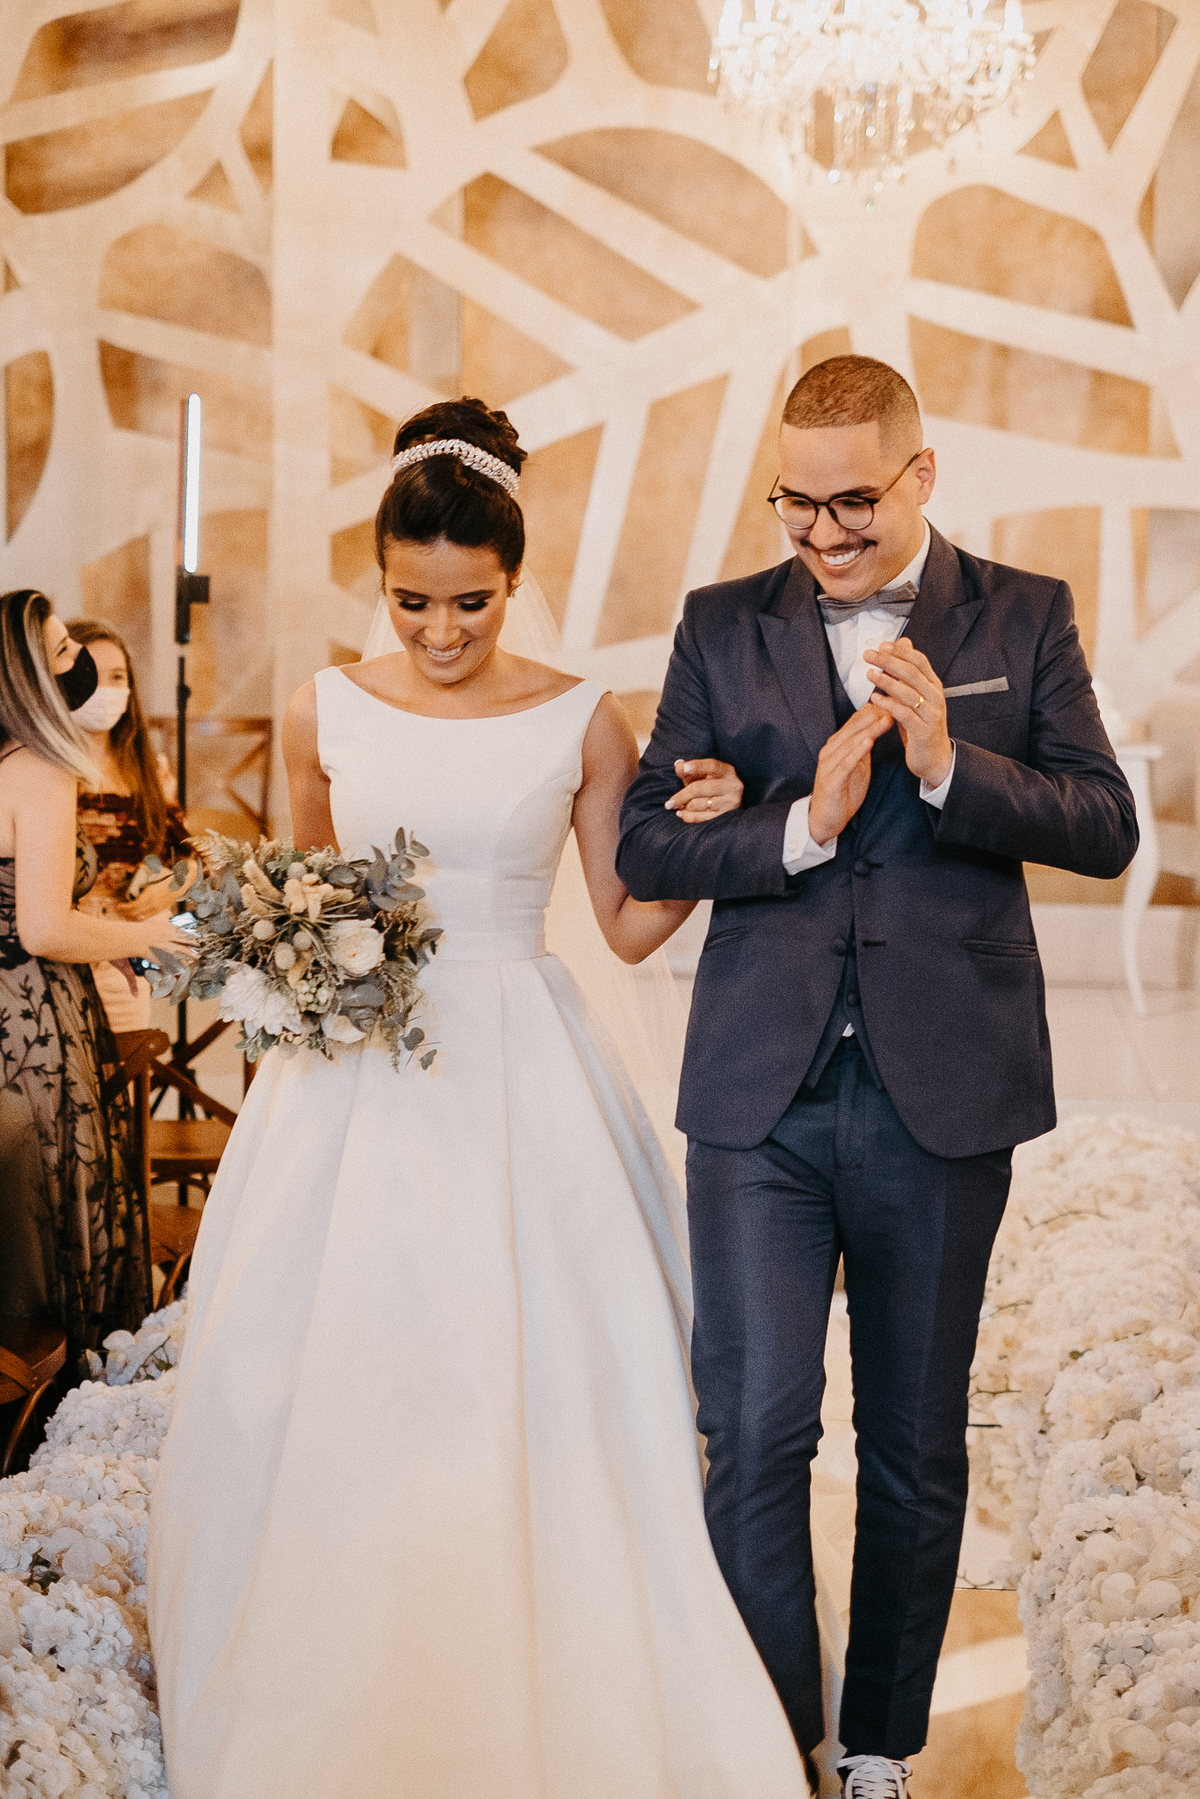 casamentos de dia fotografia de casamento casal cristao casamento mansao ferrara fotos por caio henrique saida do casal sorrindo